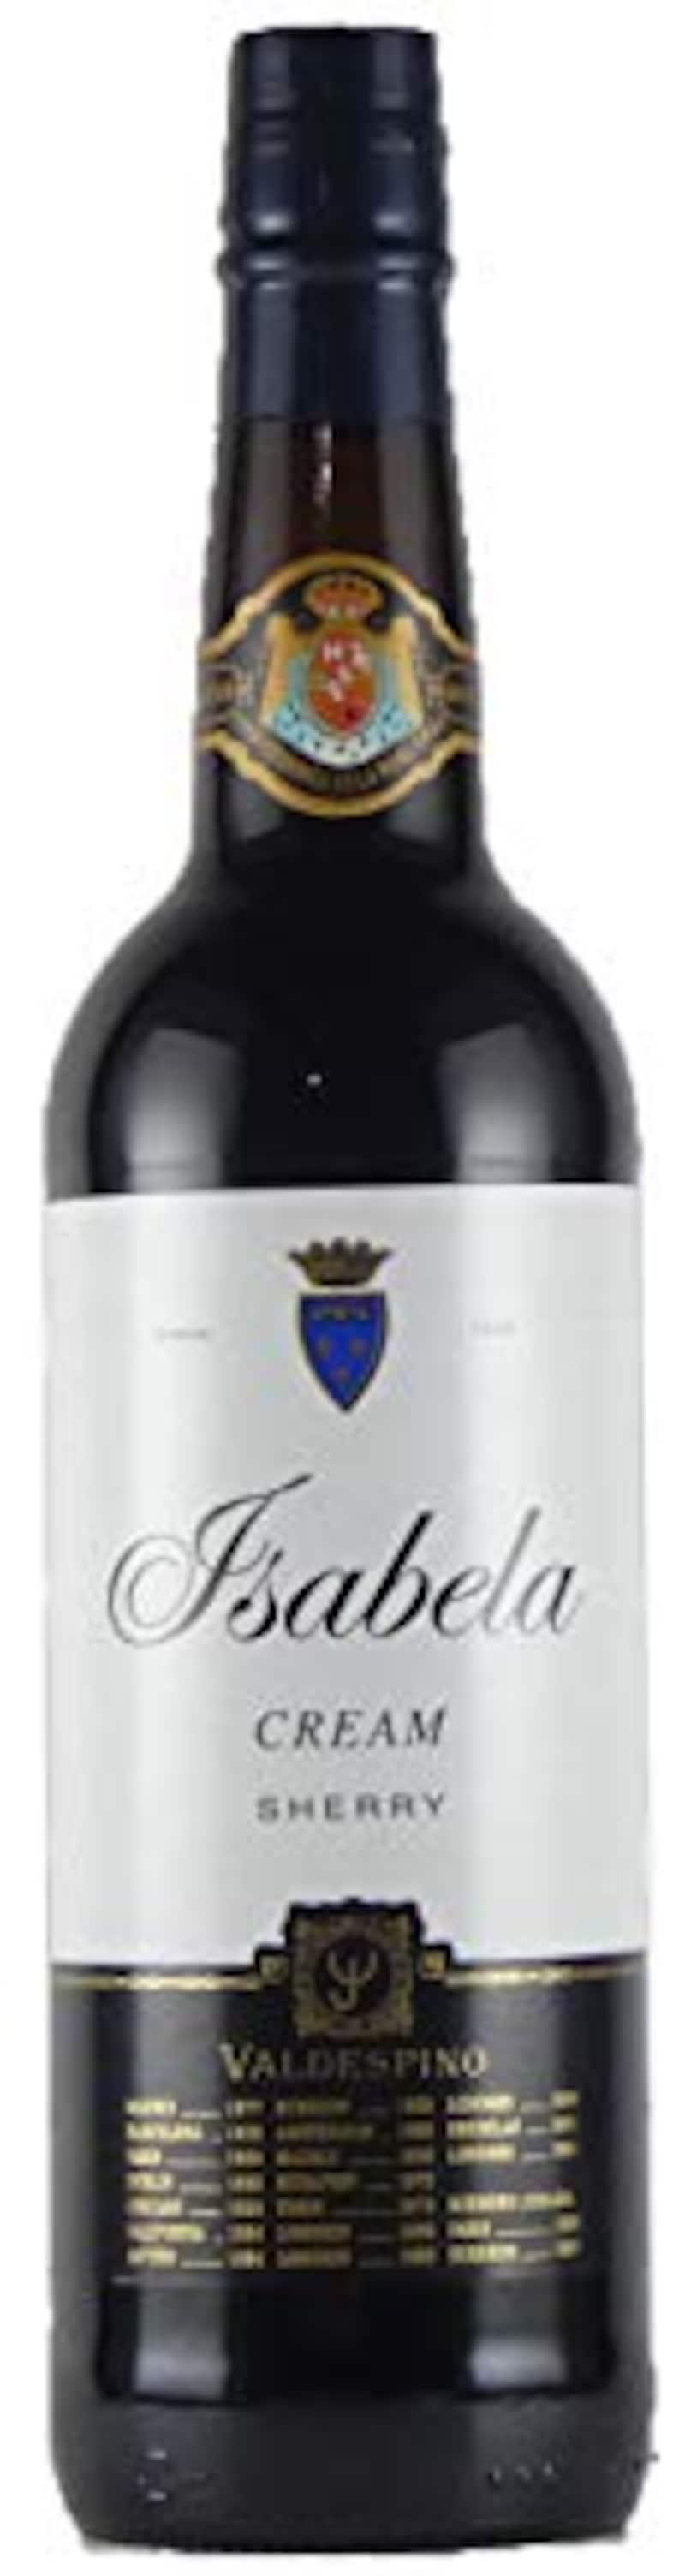 Valdespino(バルデスピノ),シェリー酒 バルデスピノ・イザベラ クリーム